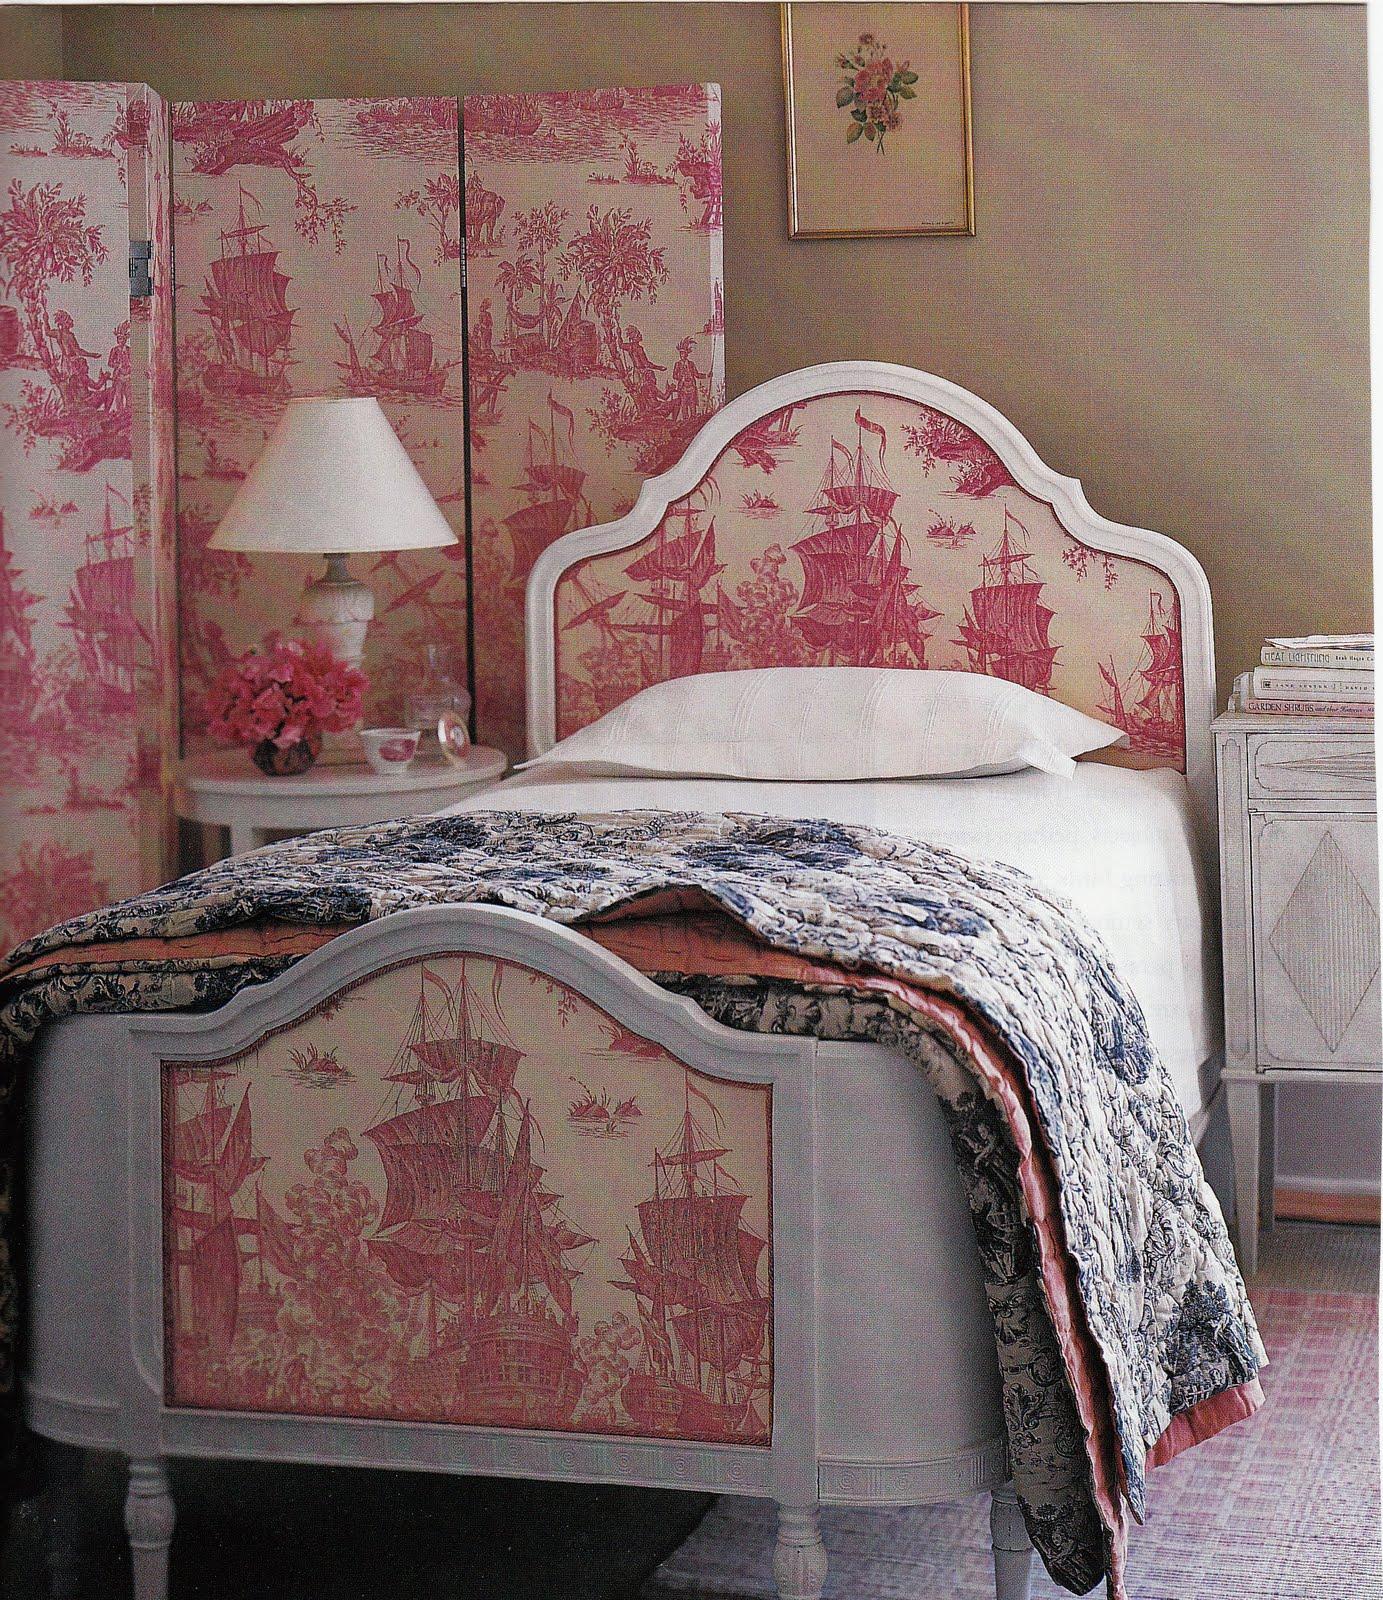 Hydrangea hill cottage toile tales - Toile de jouy decoration ...